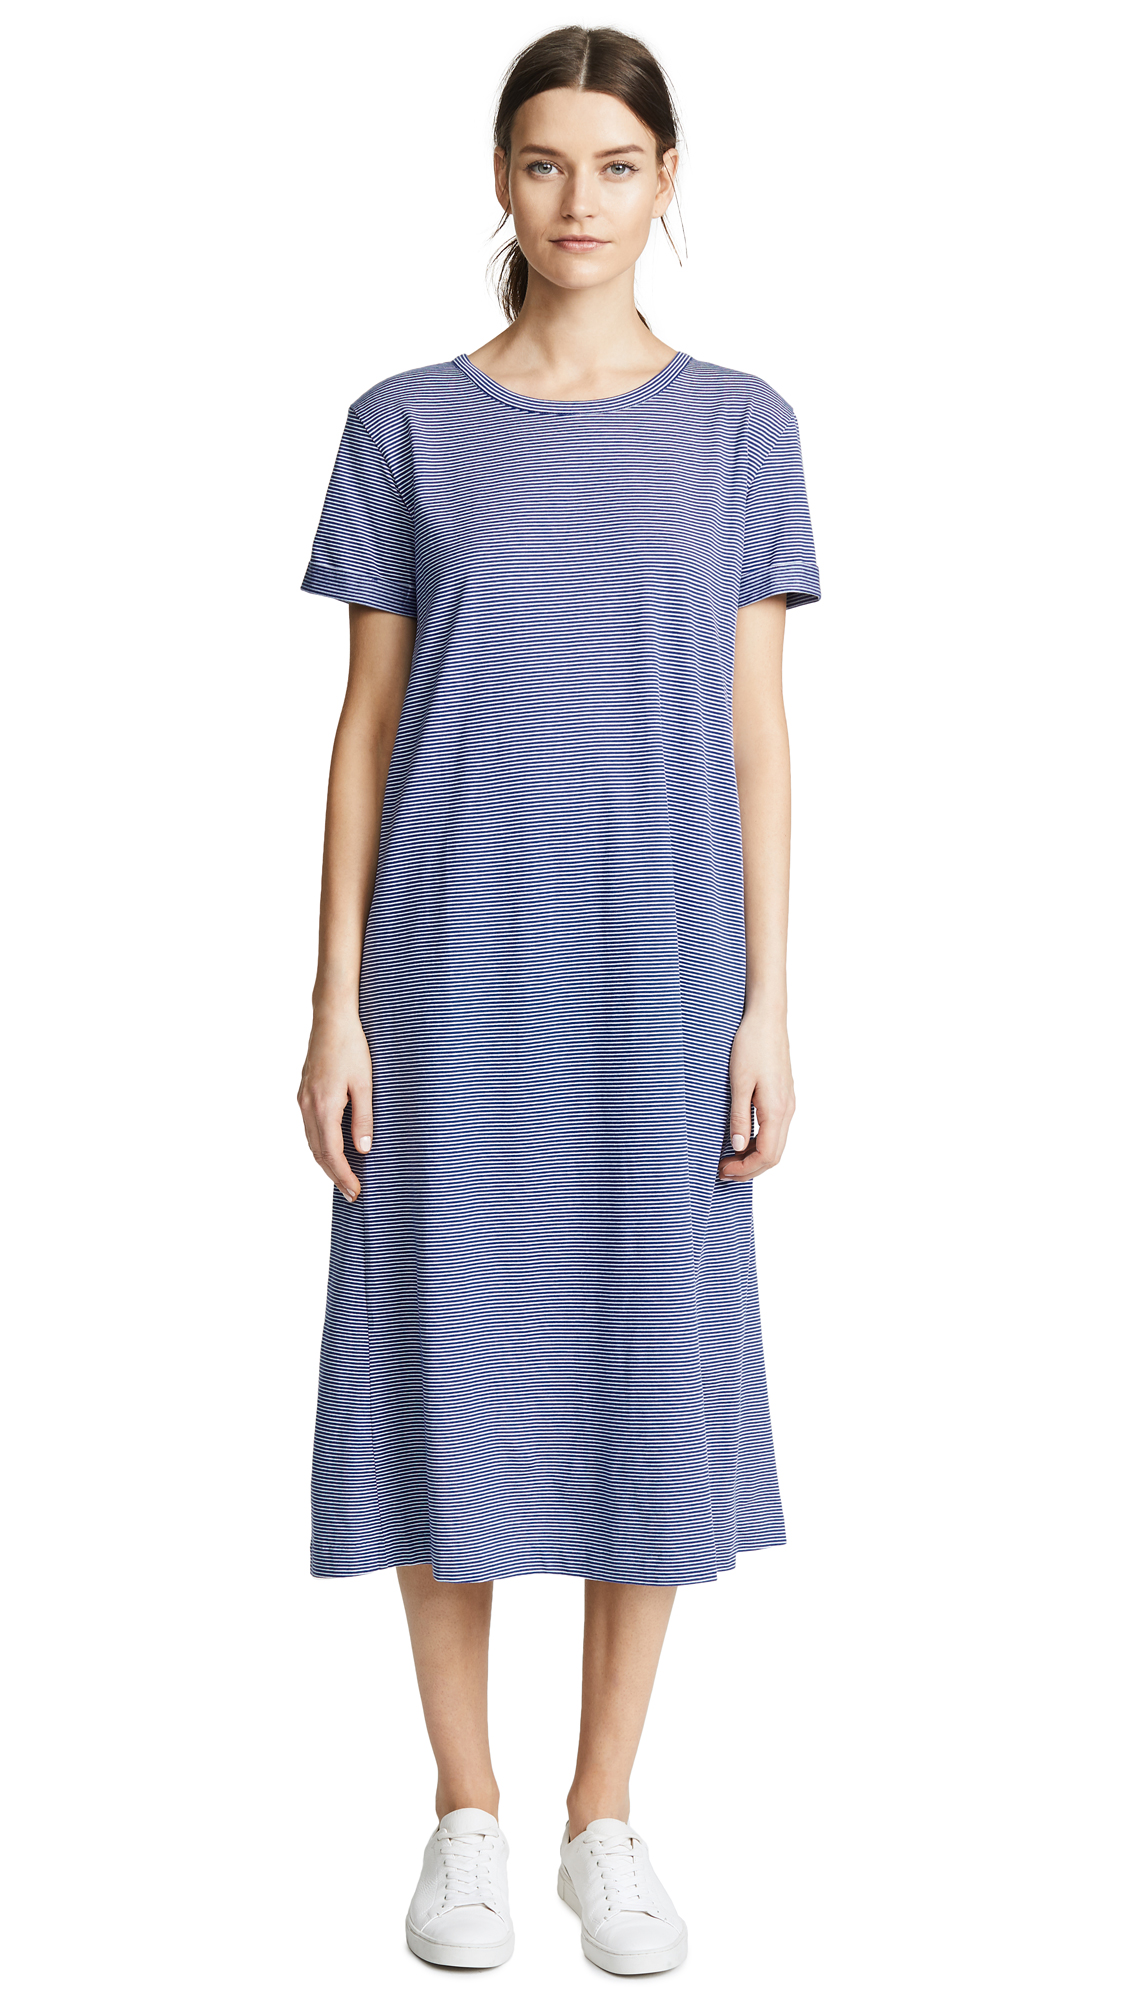 A.P.C. Lala Dress In Bleu Fonce